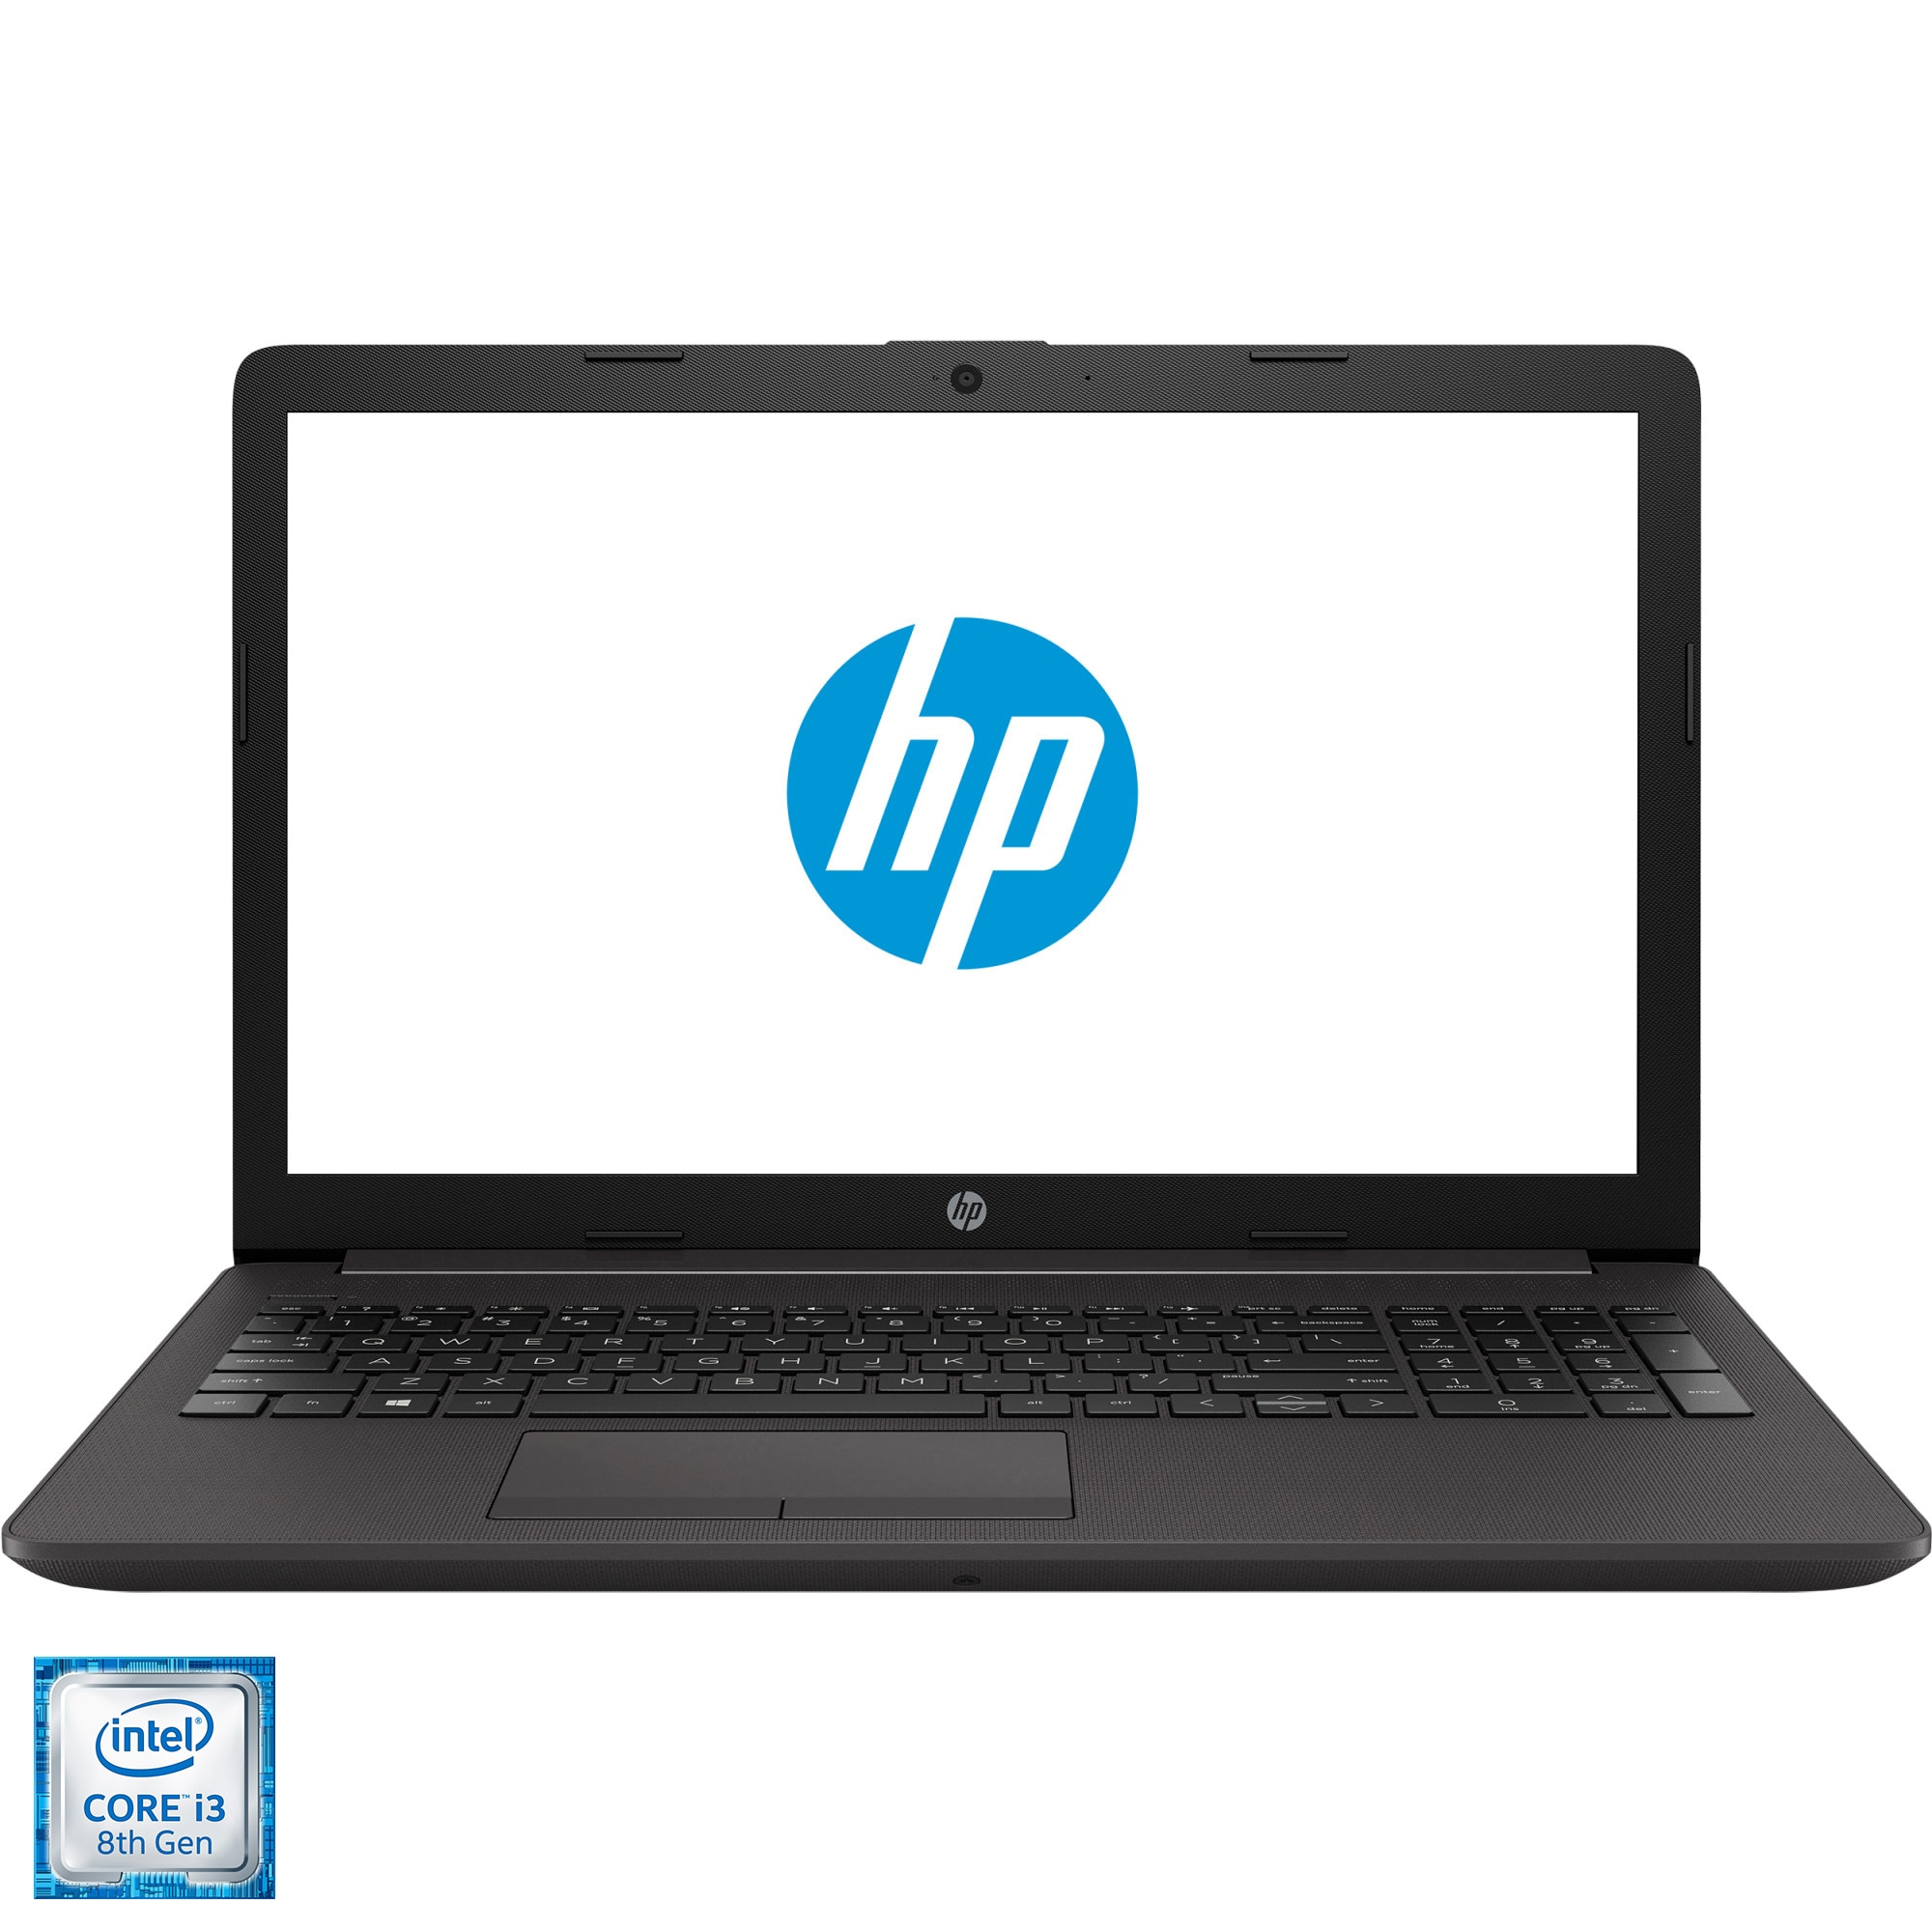 "Fotografie Laptop HP 250 G7 cu procesor Intel® Core™ i3-8130U pana la 3.40 GHz, 15.6"", Full HD, 8GB, 256GB SSD, NVIDIA® GeForce® MX110 2GB, Free DOS, Dark ash silver"